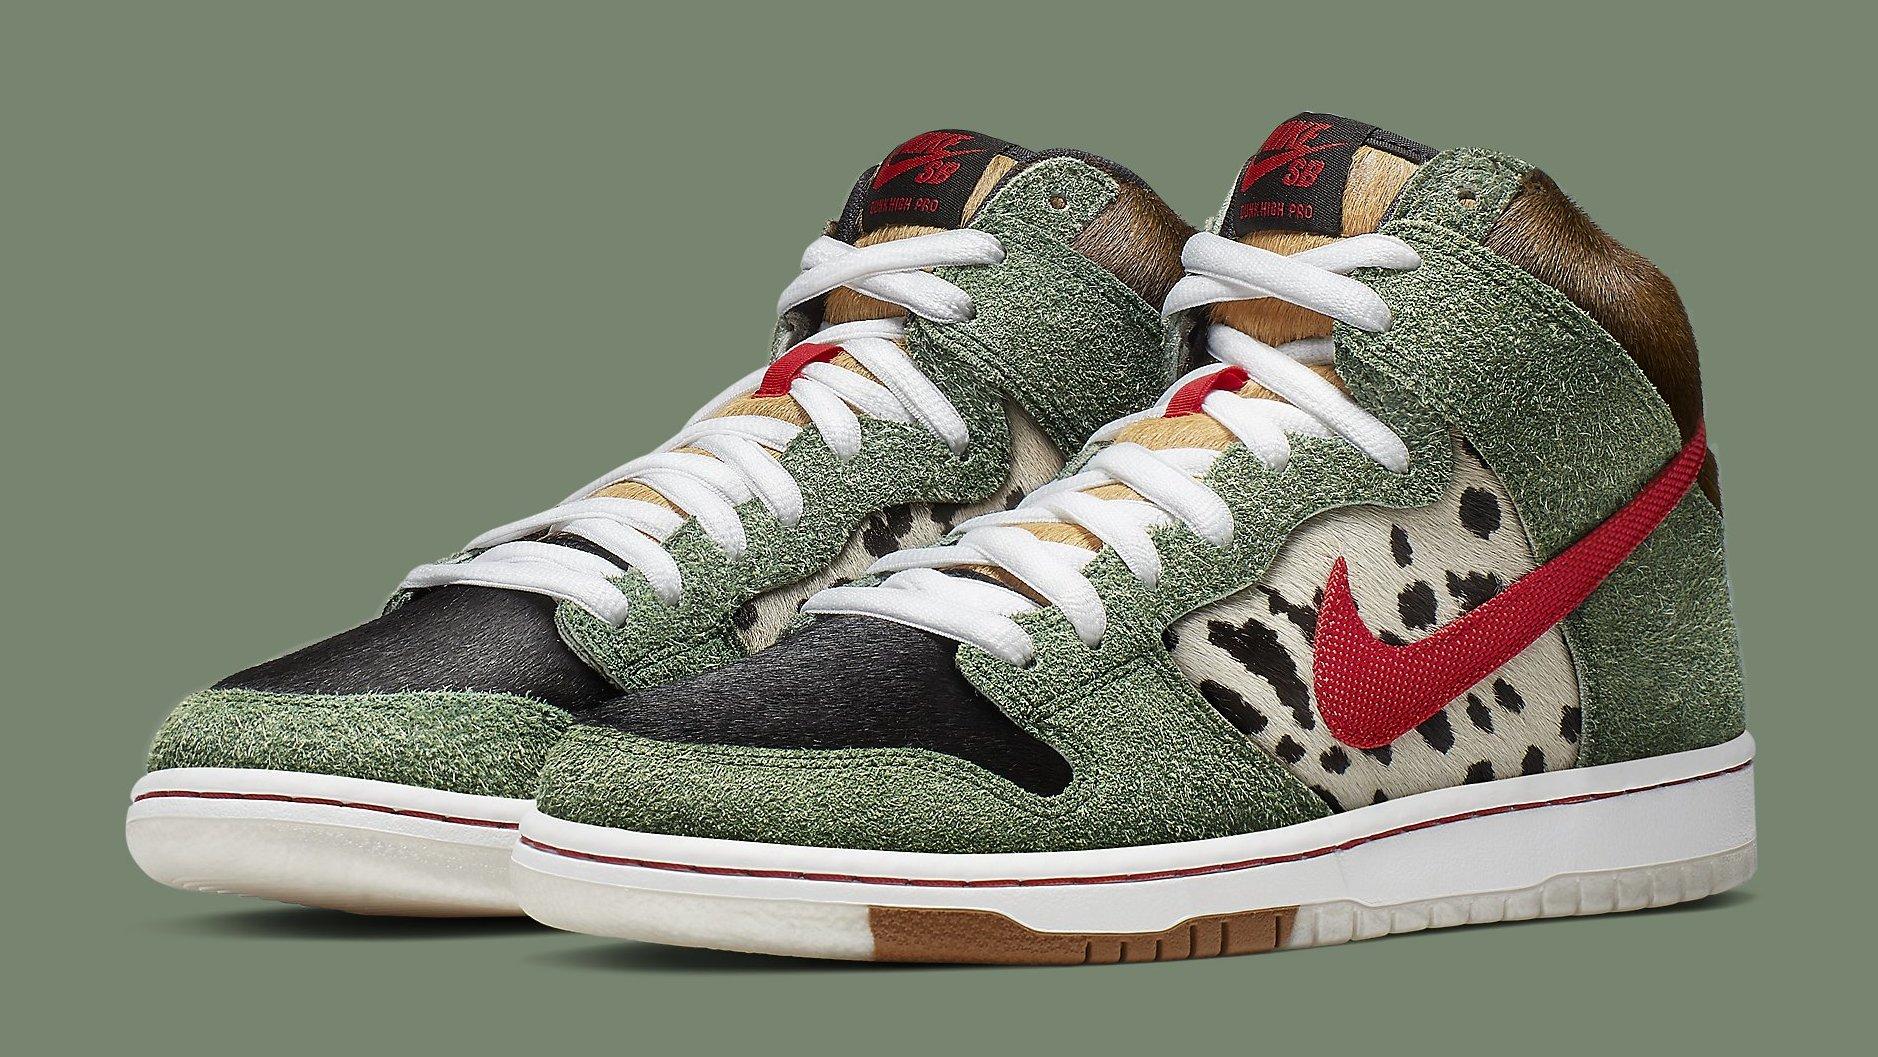 perspectiva Claraboya Conciliador  Nike SB Dunk High 'Dog Walker' Release Date | Sole Collector